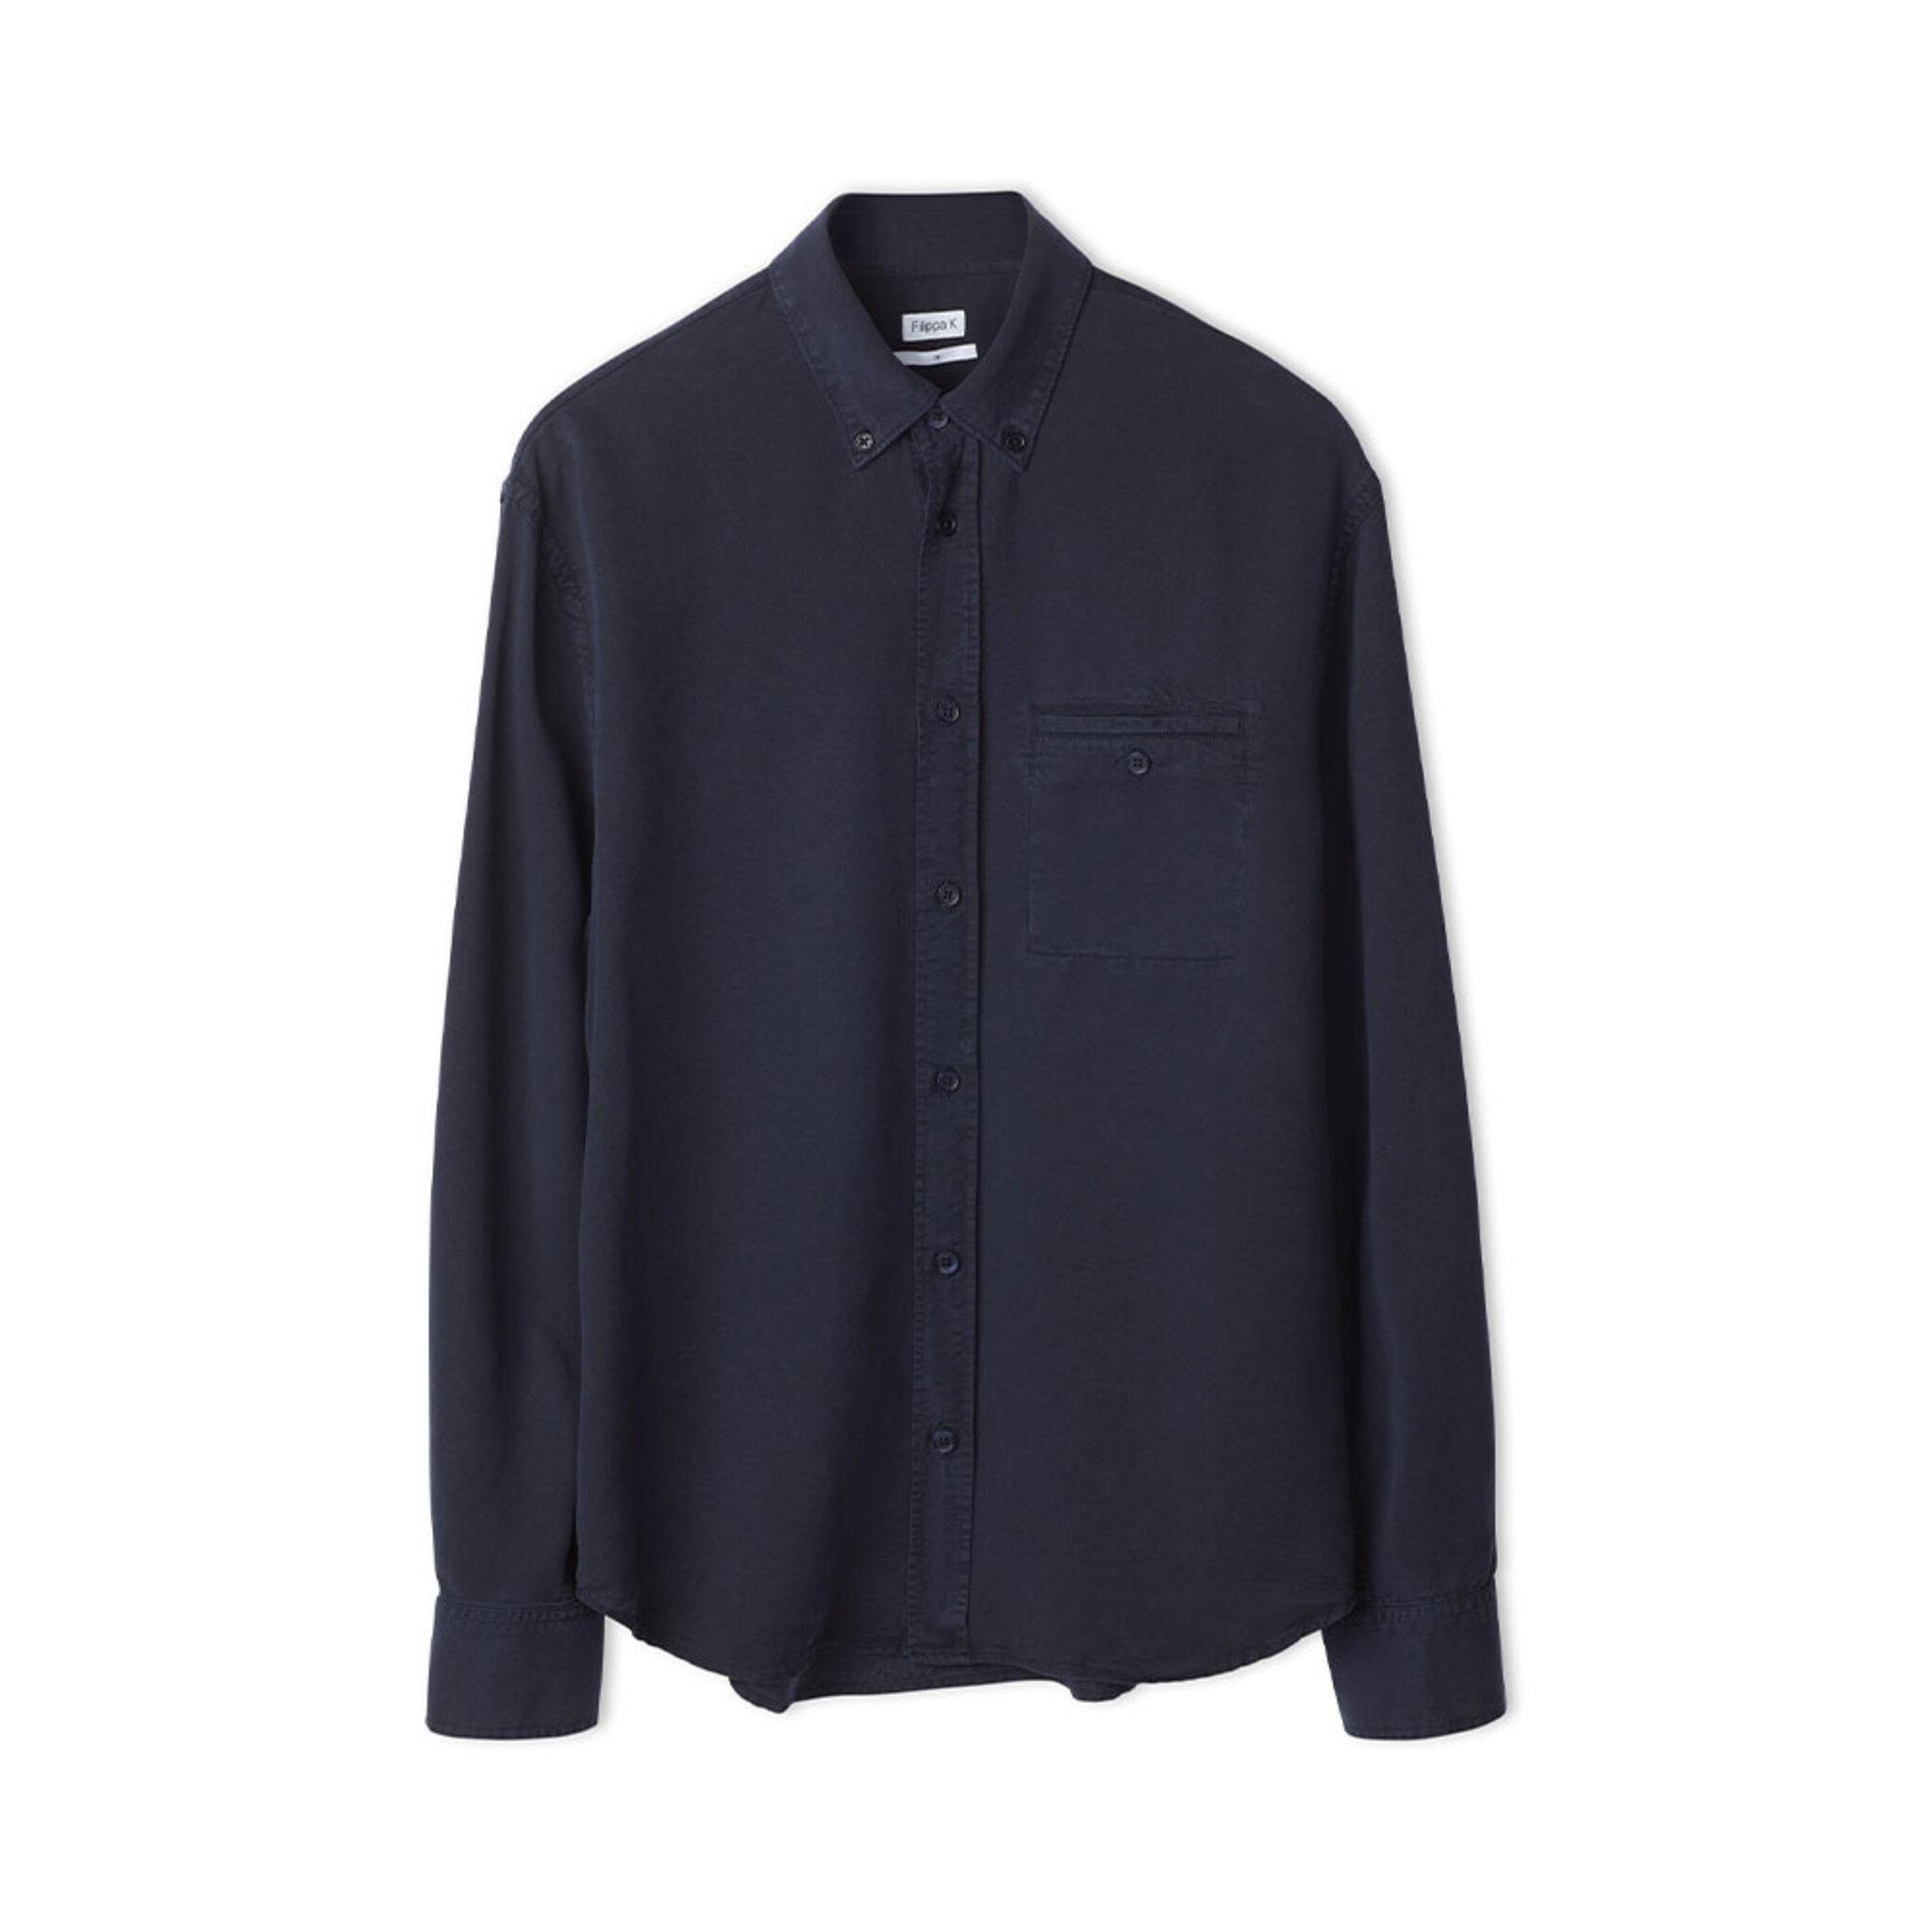 M. Zachary Tencel Shirt